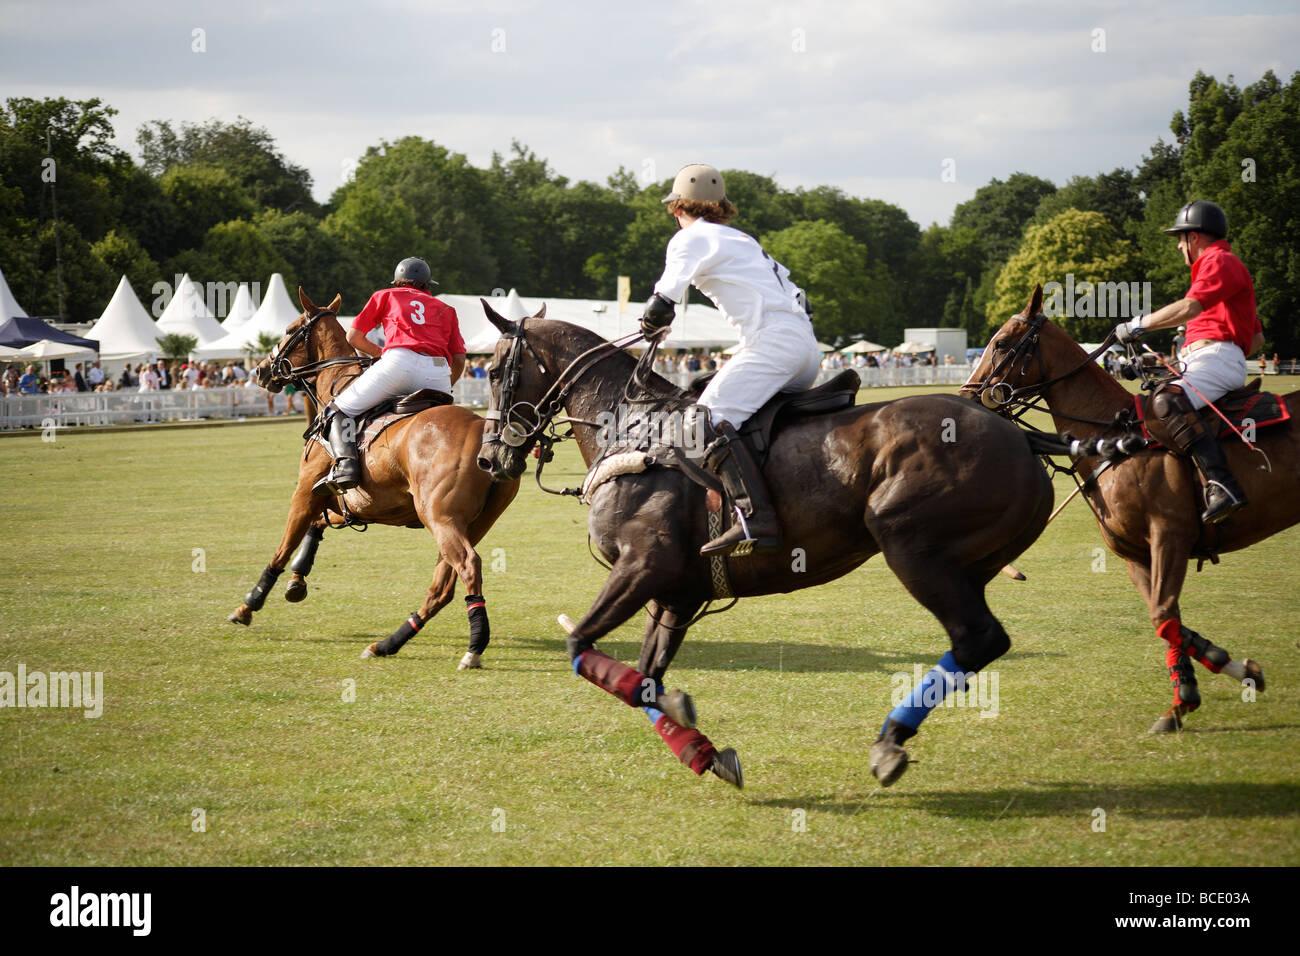 Polo match,England vs Argentina - Stock Image